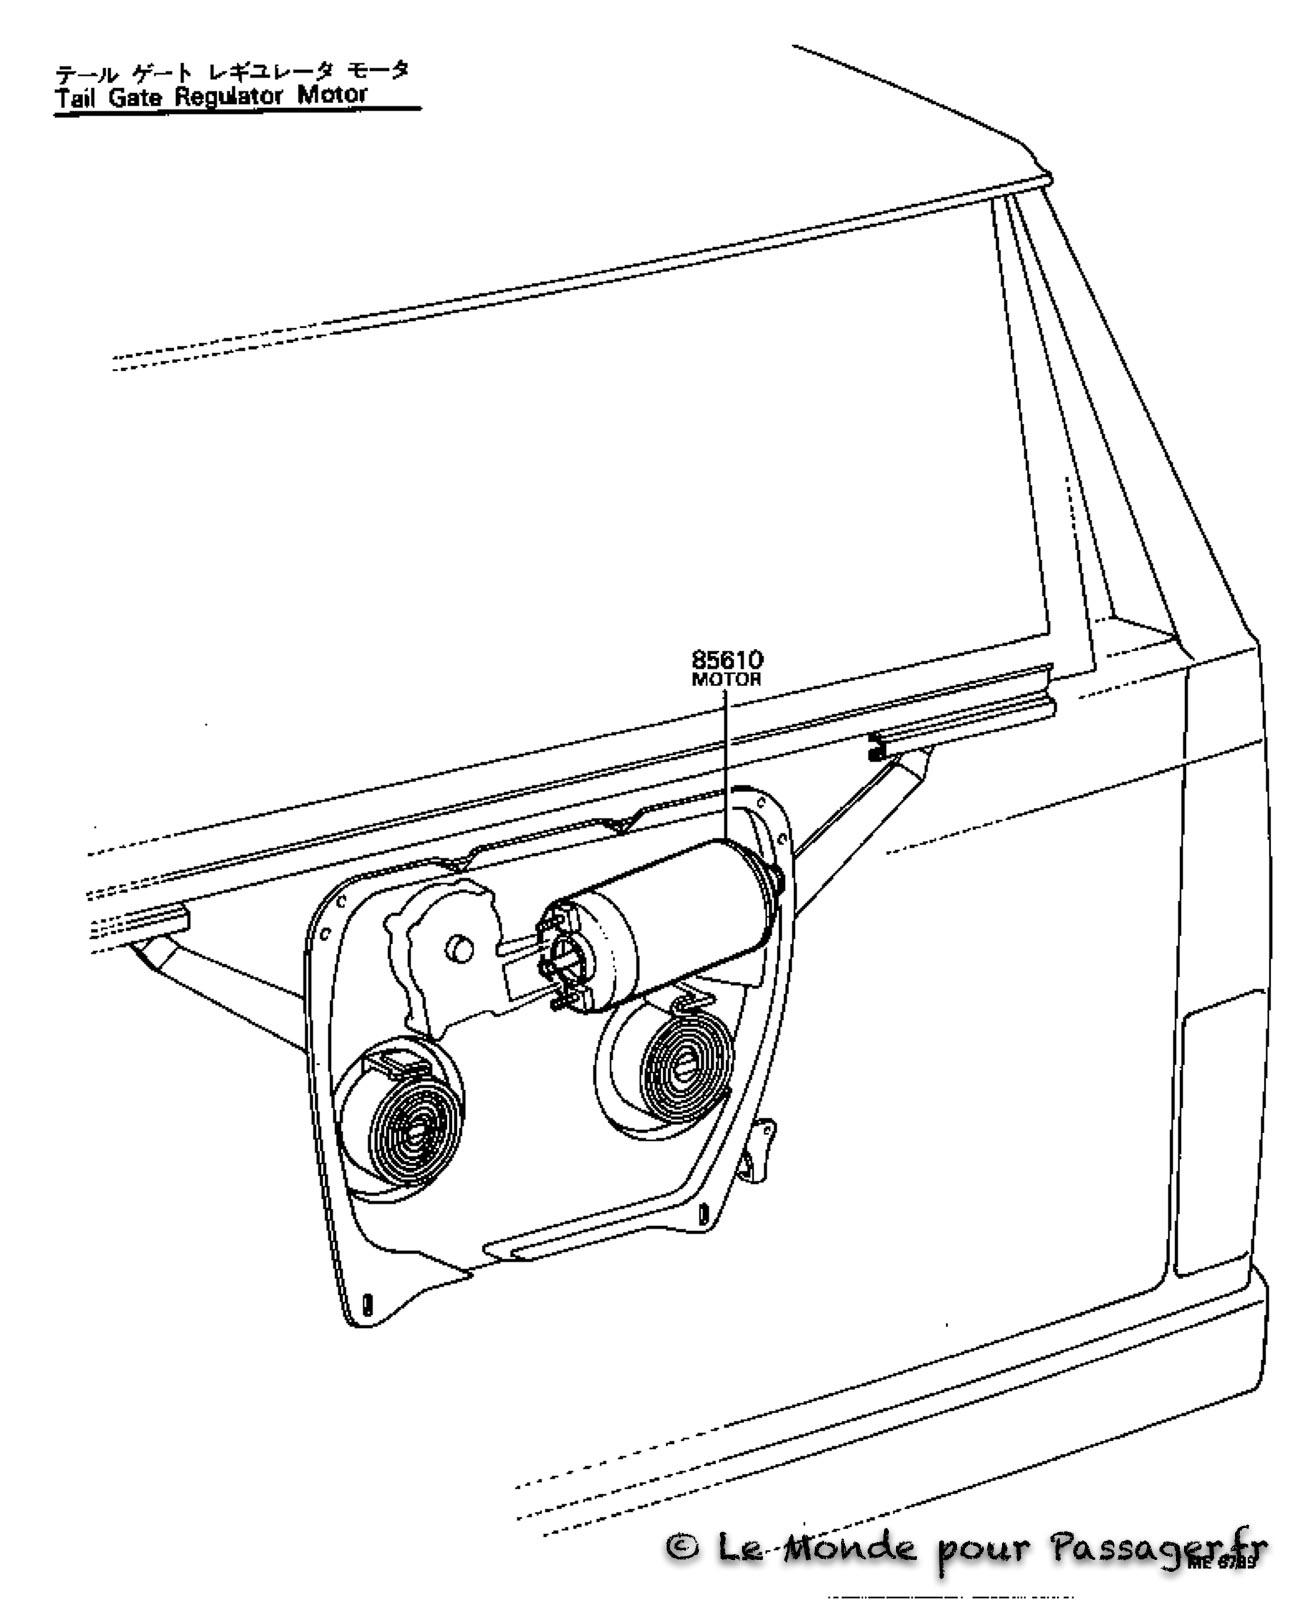 Fj55-Eclatés-Techniques023